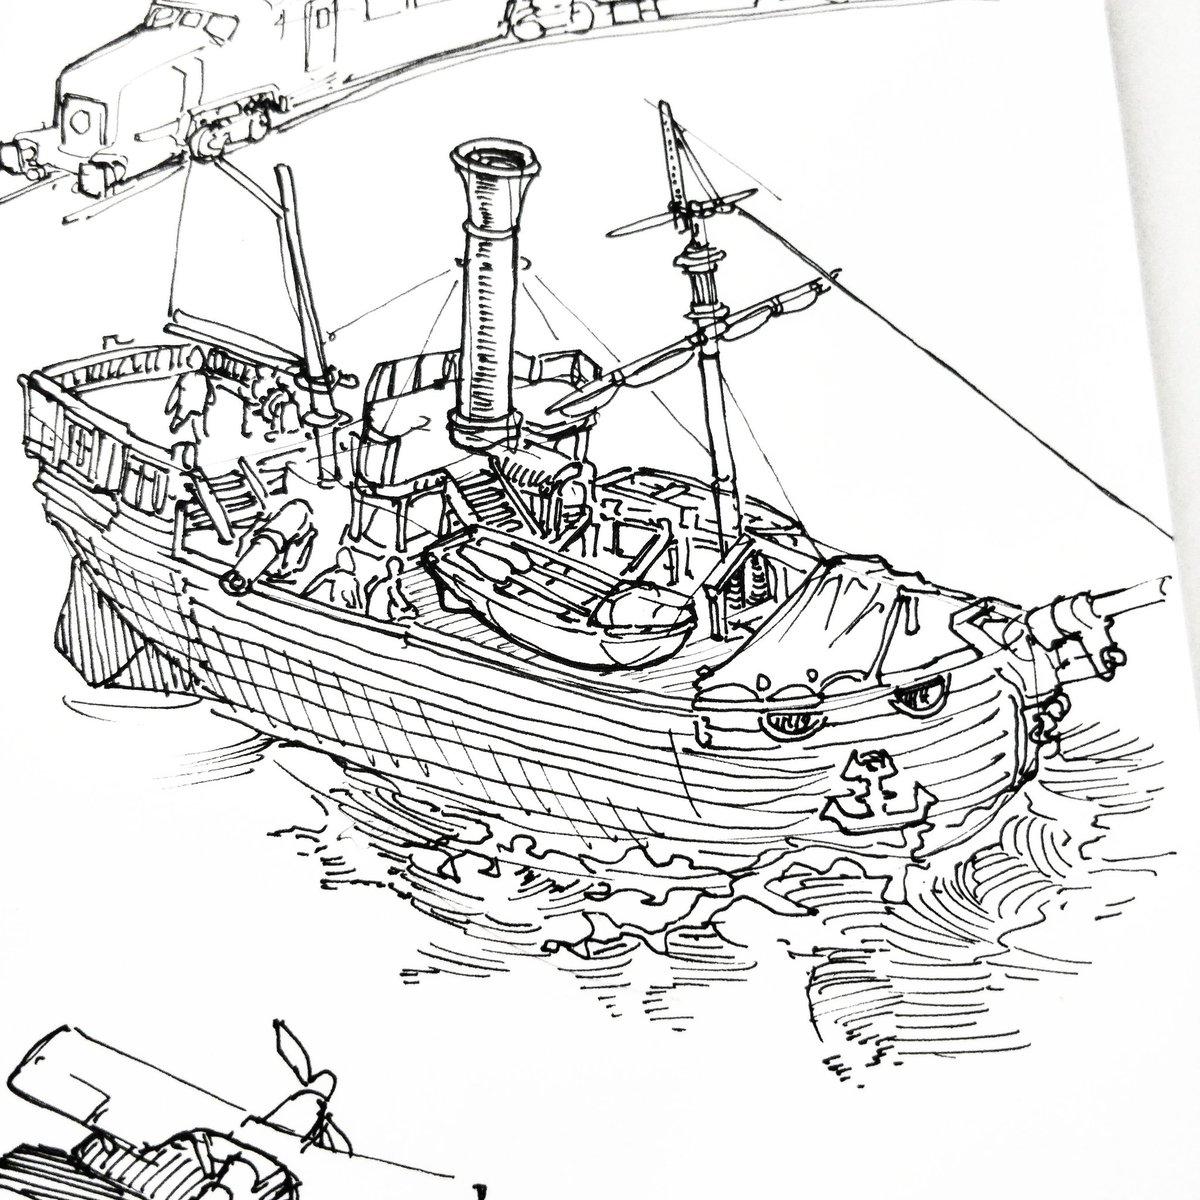 little sketch #boat pic.twitter.com/dPSY7DPufY